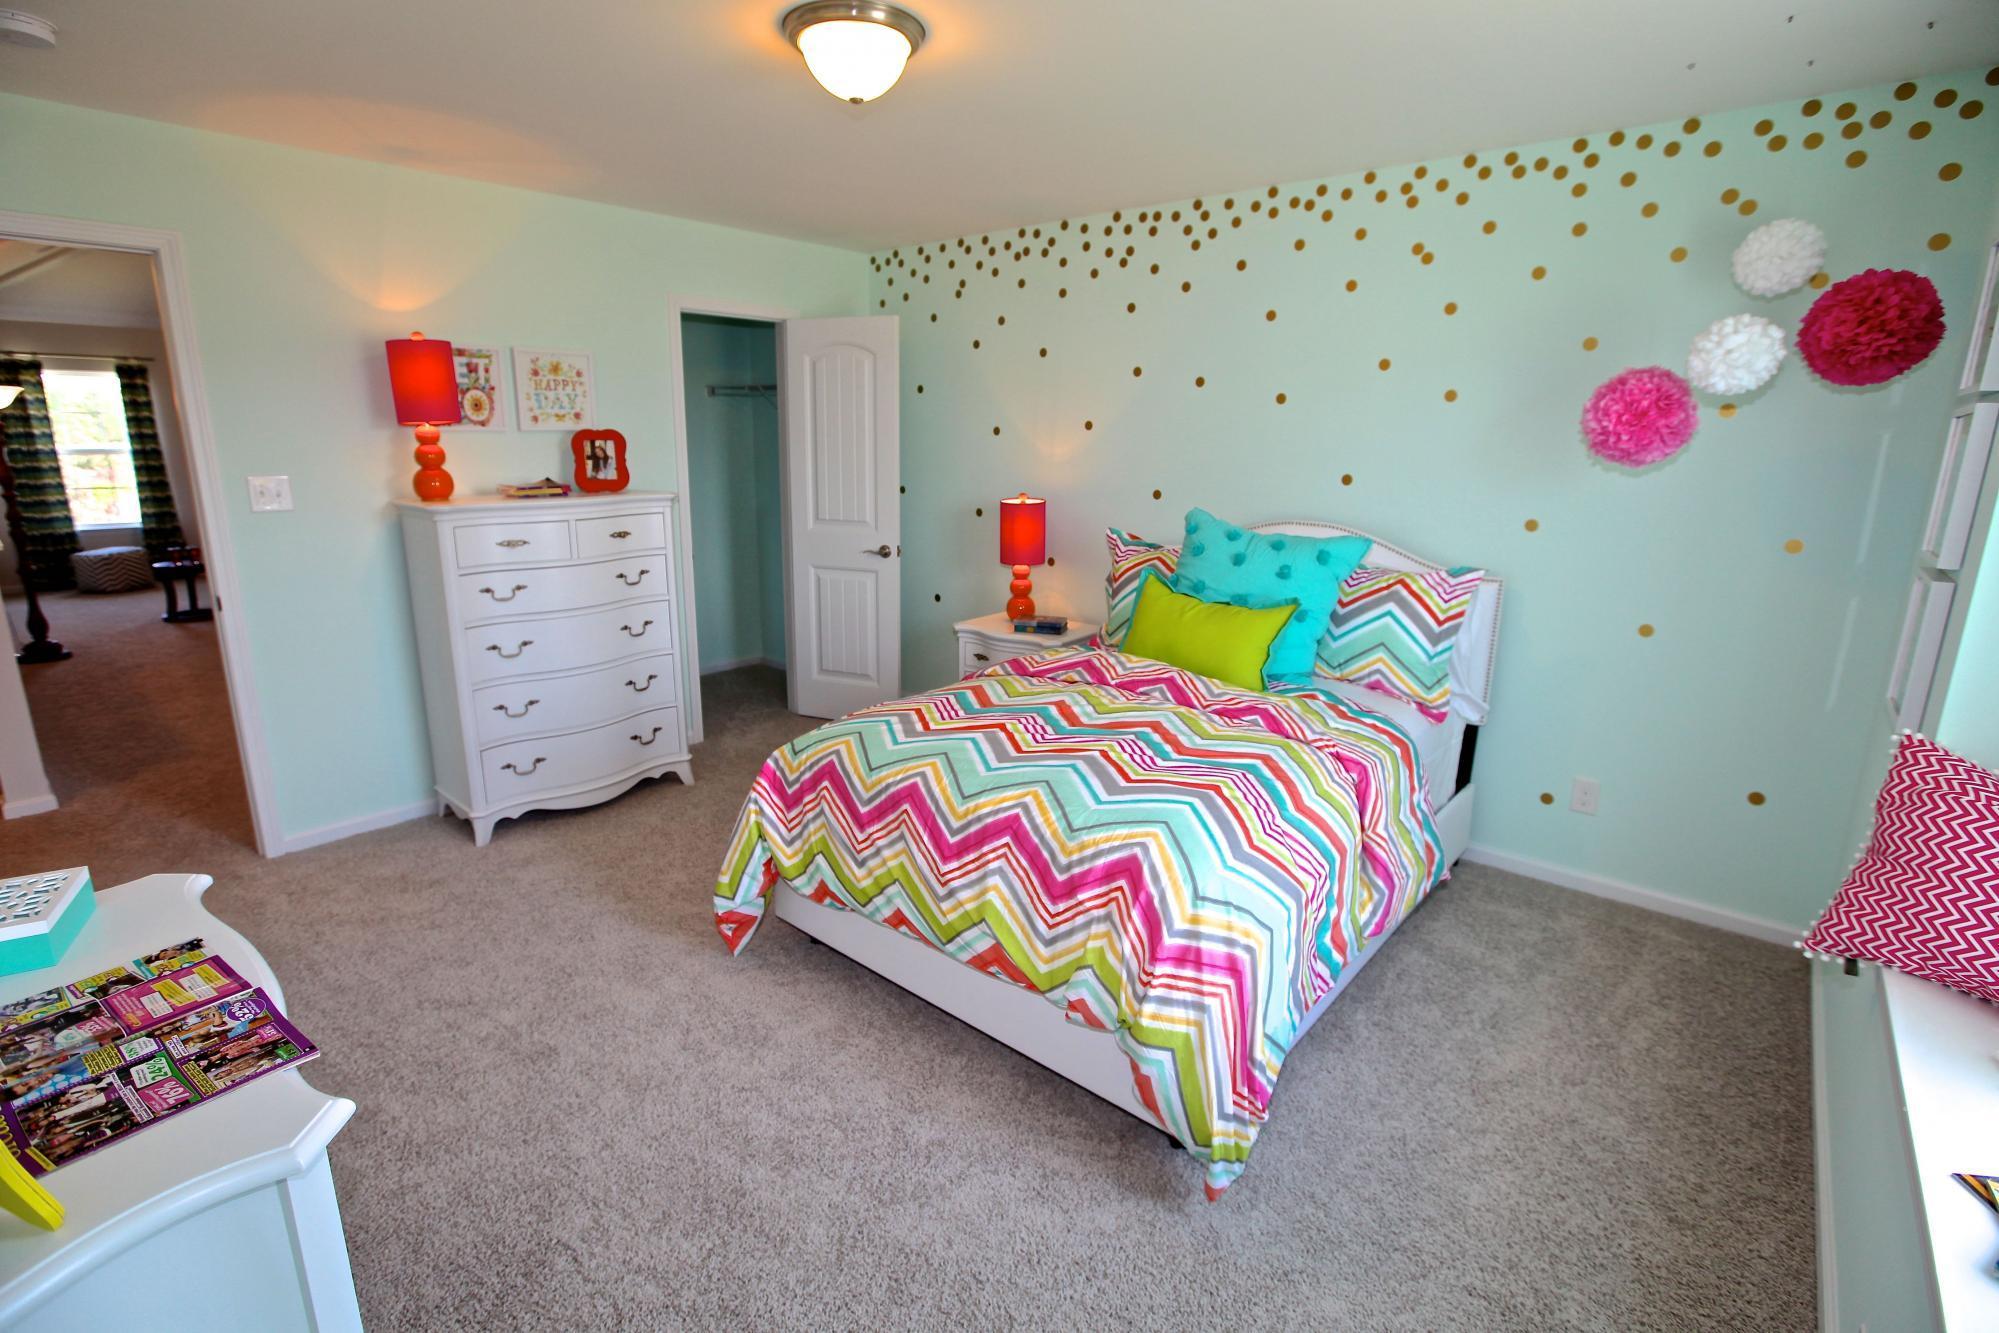 Bedroom featured in the Oglethorpe By Konter Quality Homes in Savannah, GA